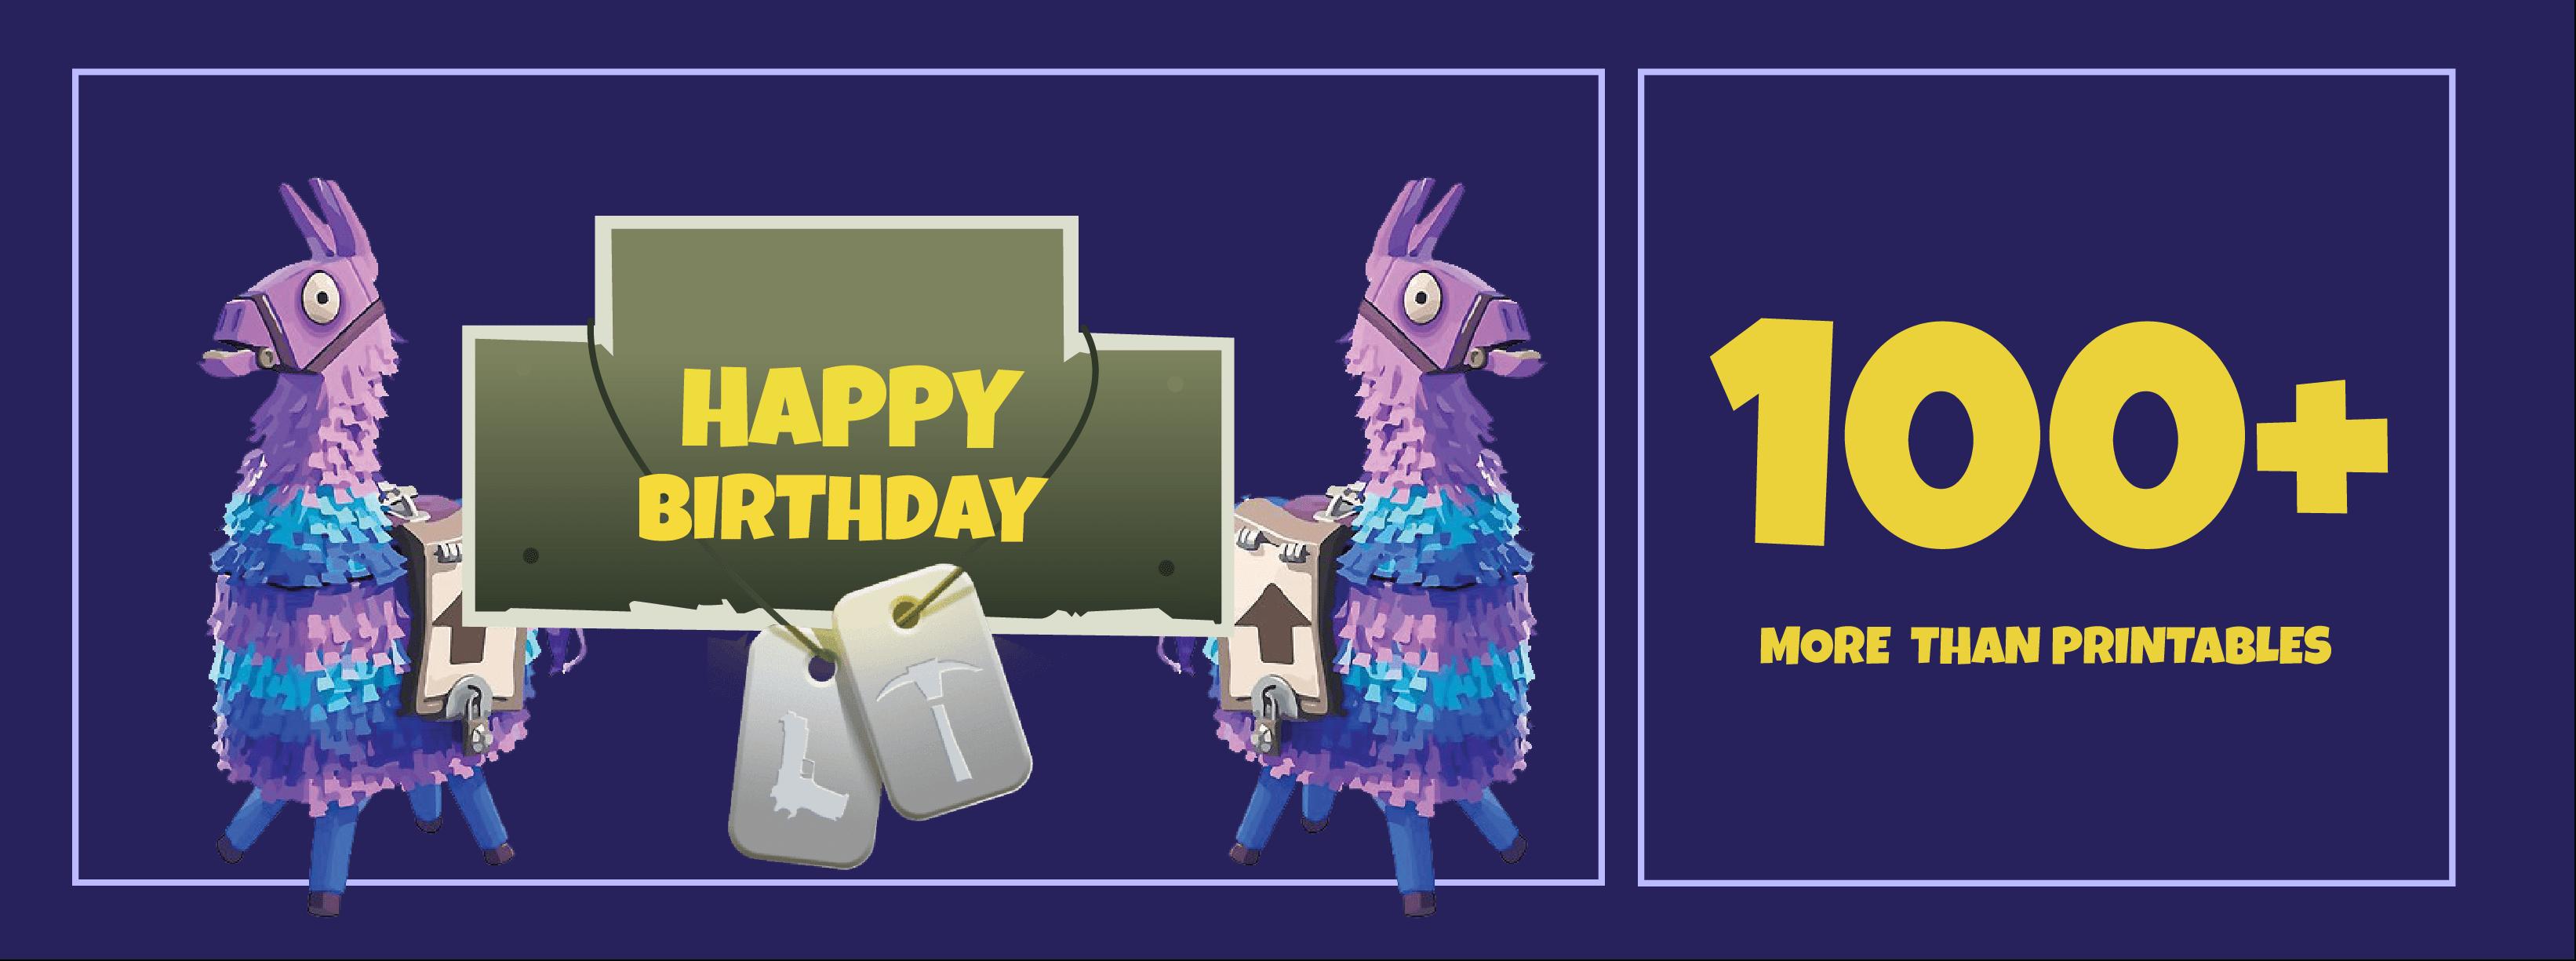 13 Epic Fortnite Birthday Party Ideas (Diy & Printables) - Epic - Free Fortnite Party Printables